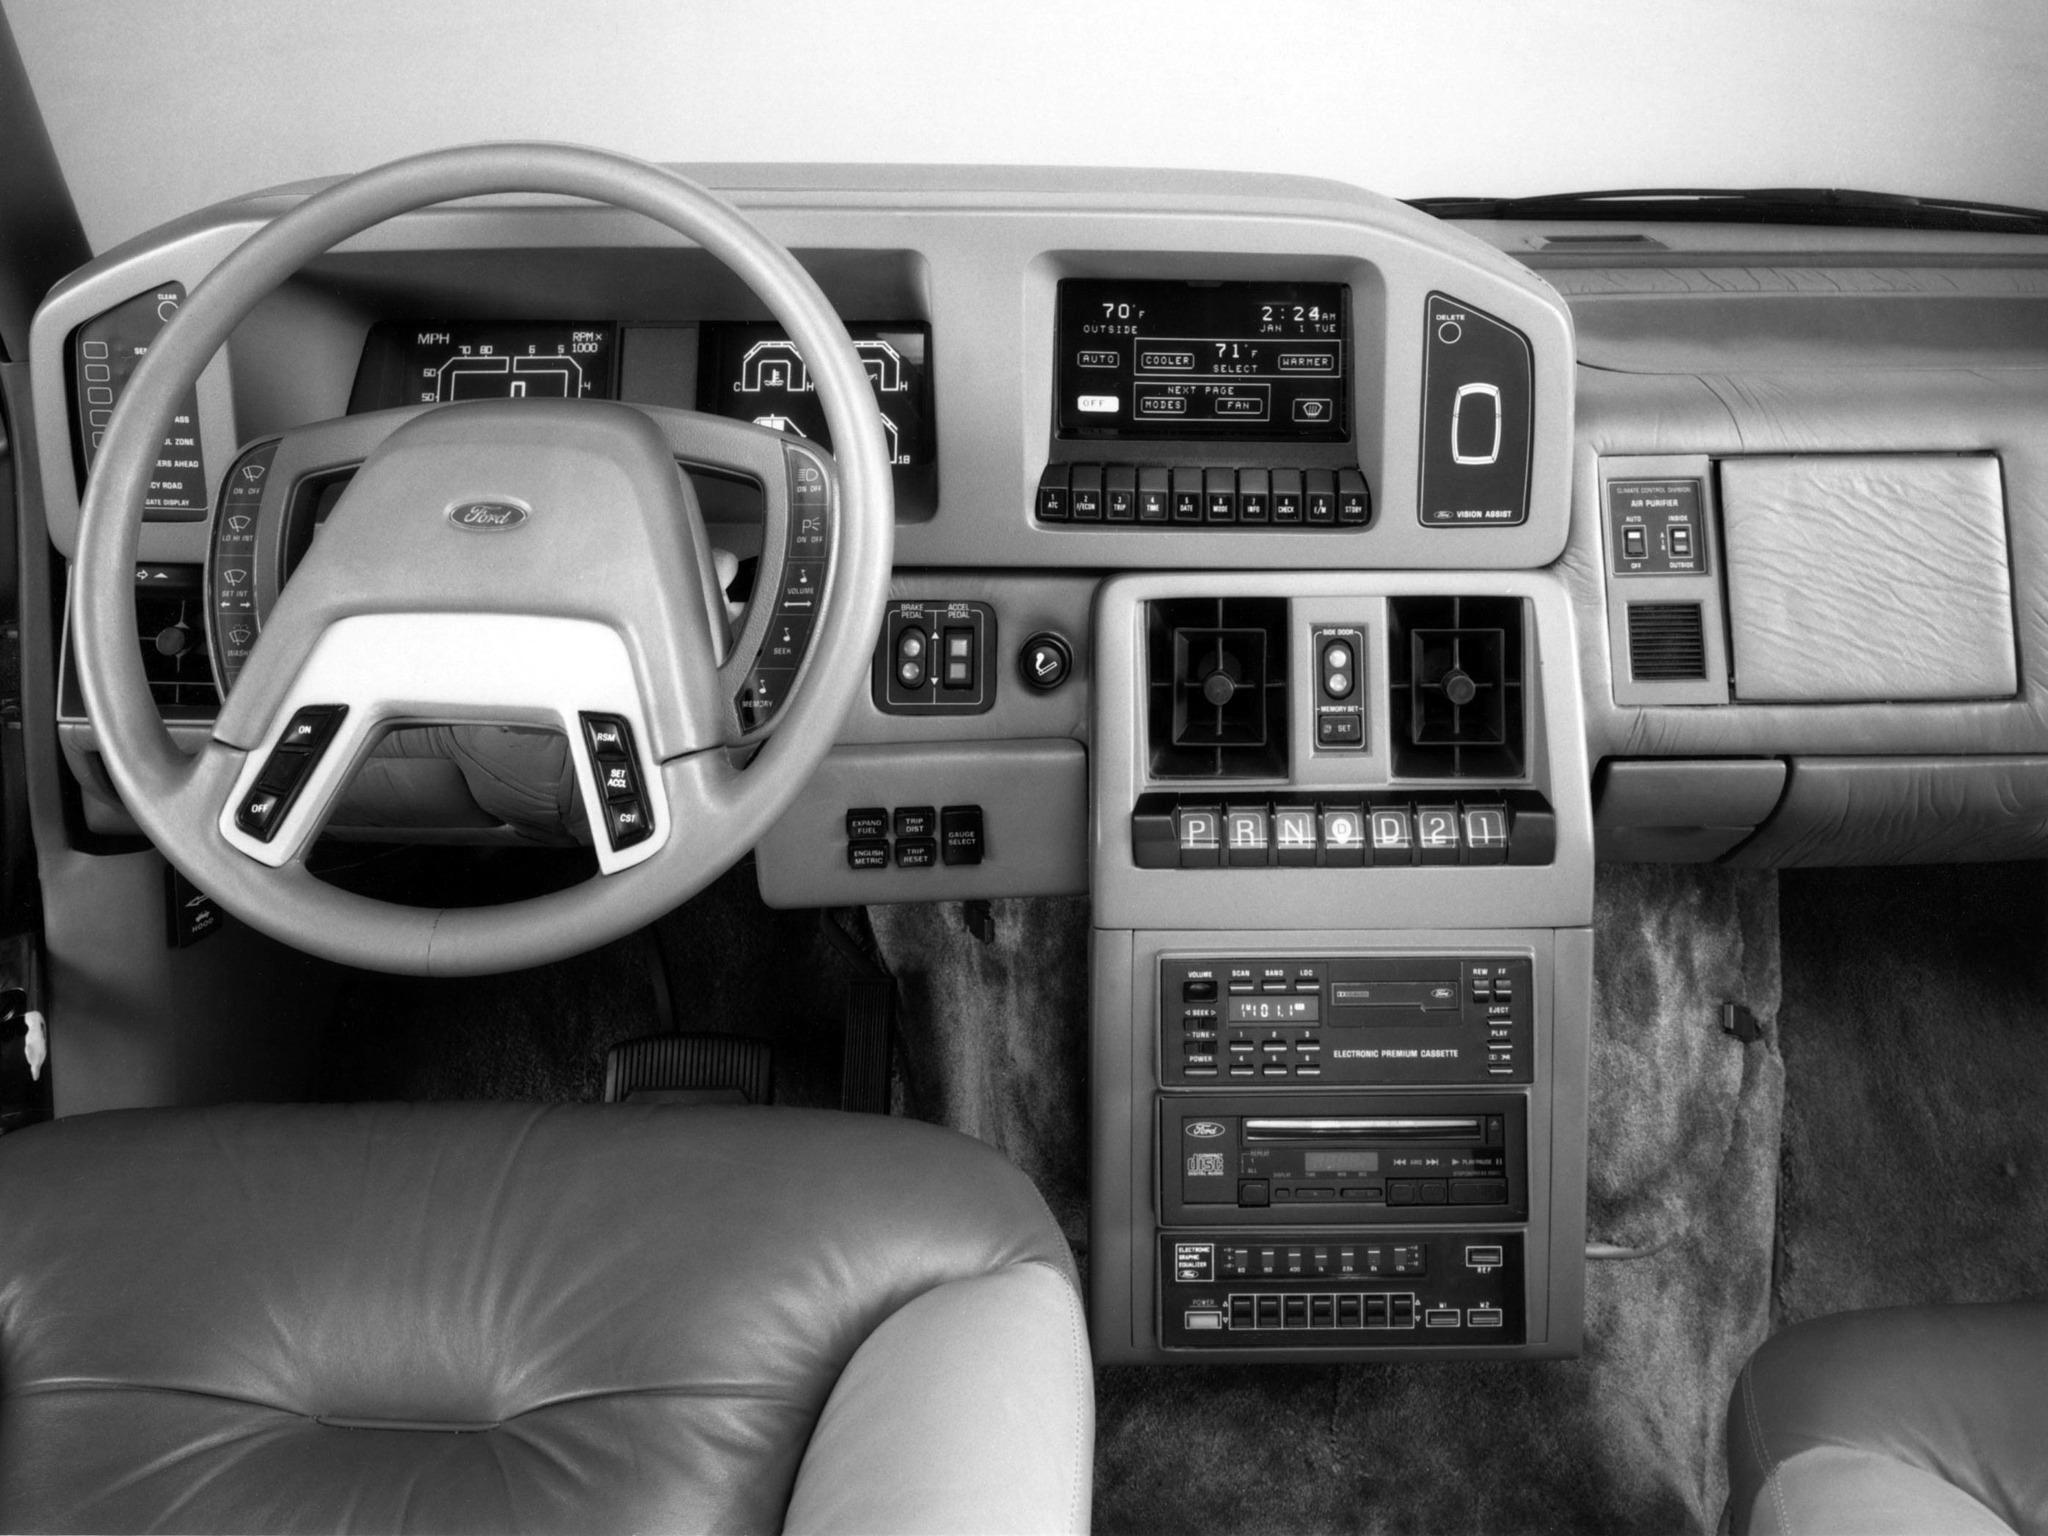 1987_Ghia_Ford_HFX_Aerostar_Interior_01